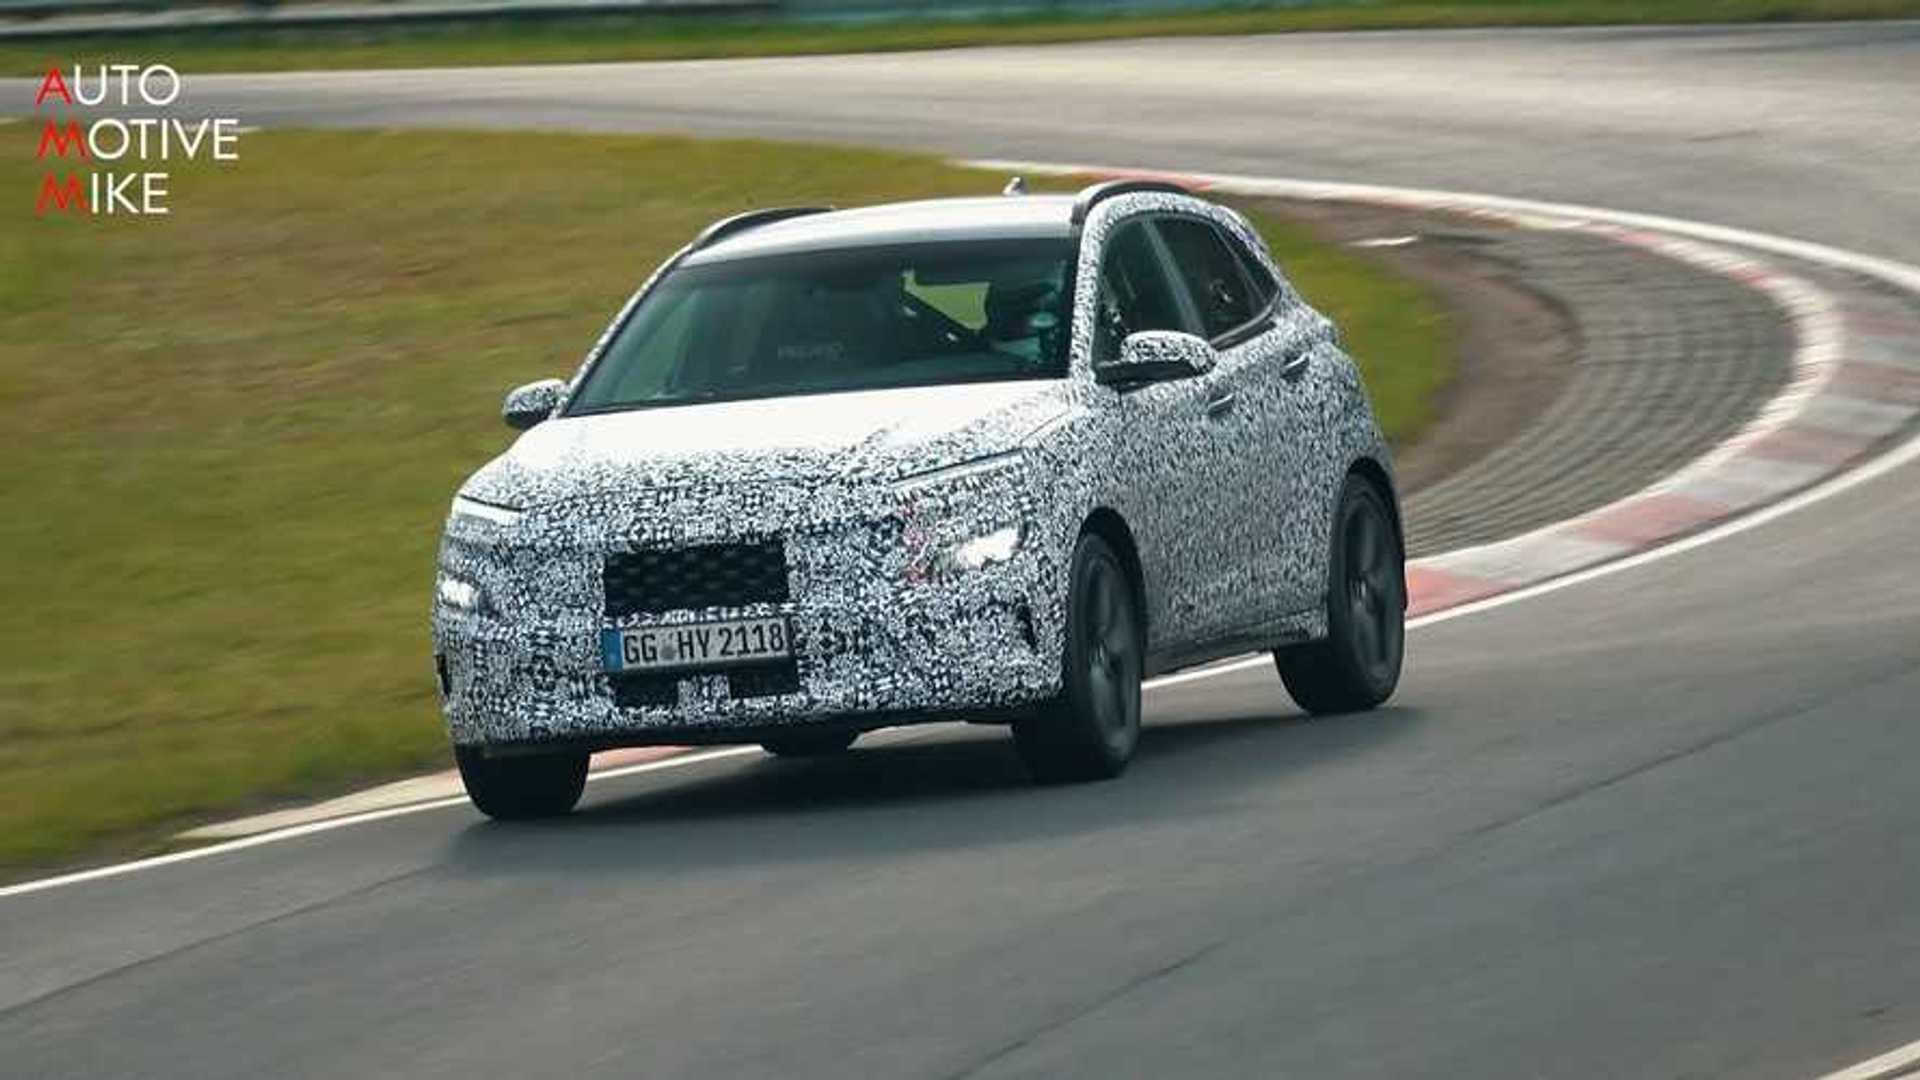 2021 Hyundai Kona N Spied On Video Having Hot Hatch Fun